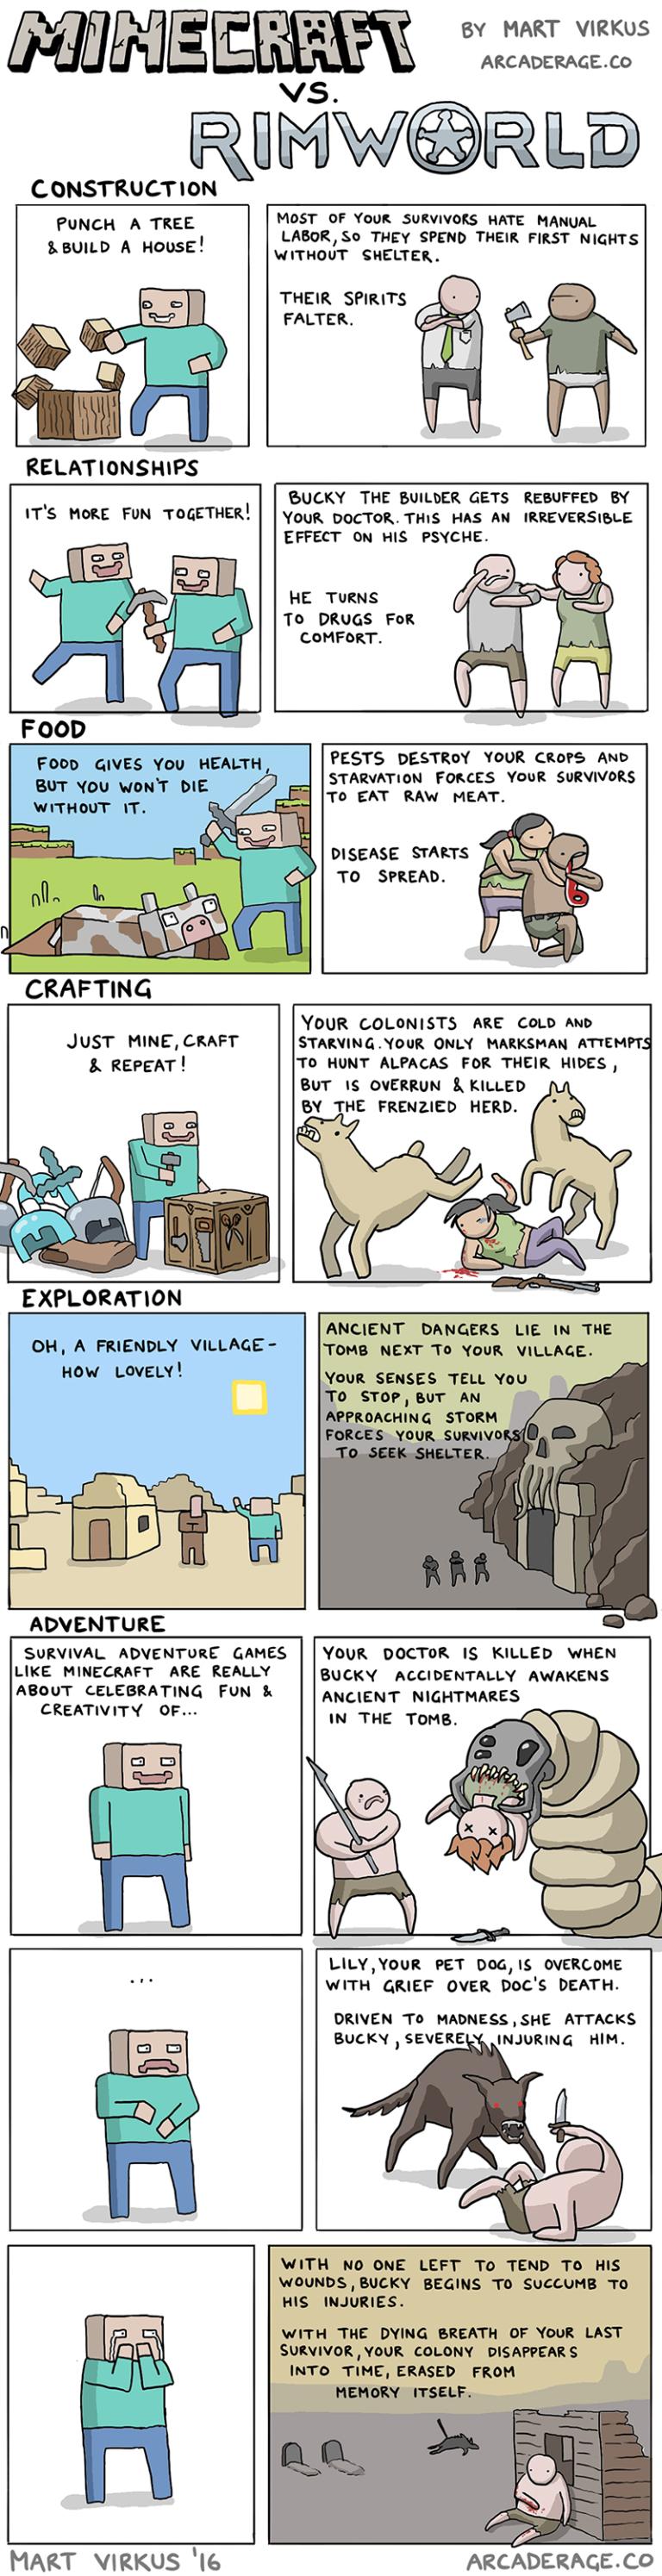 Minecraft vs Rimworld | best | Funny games, Video games